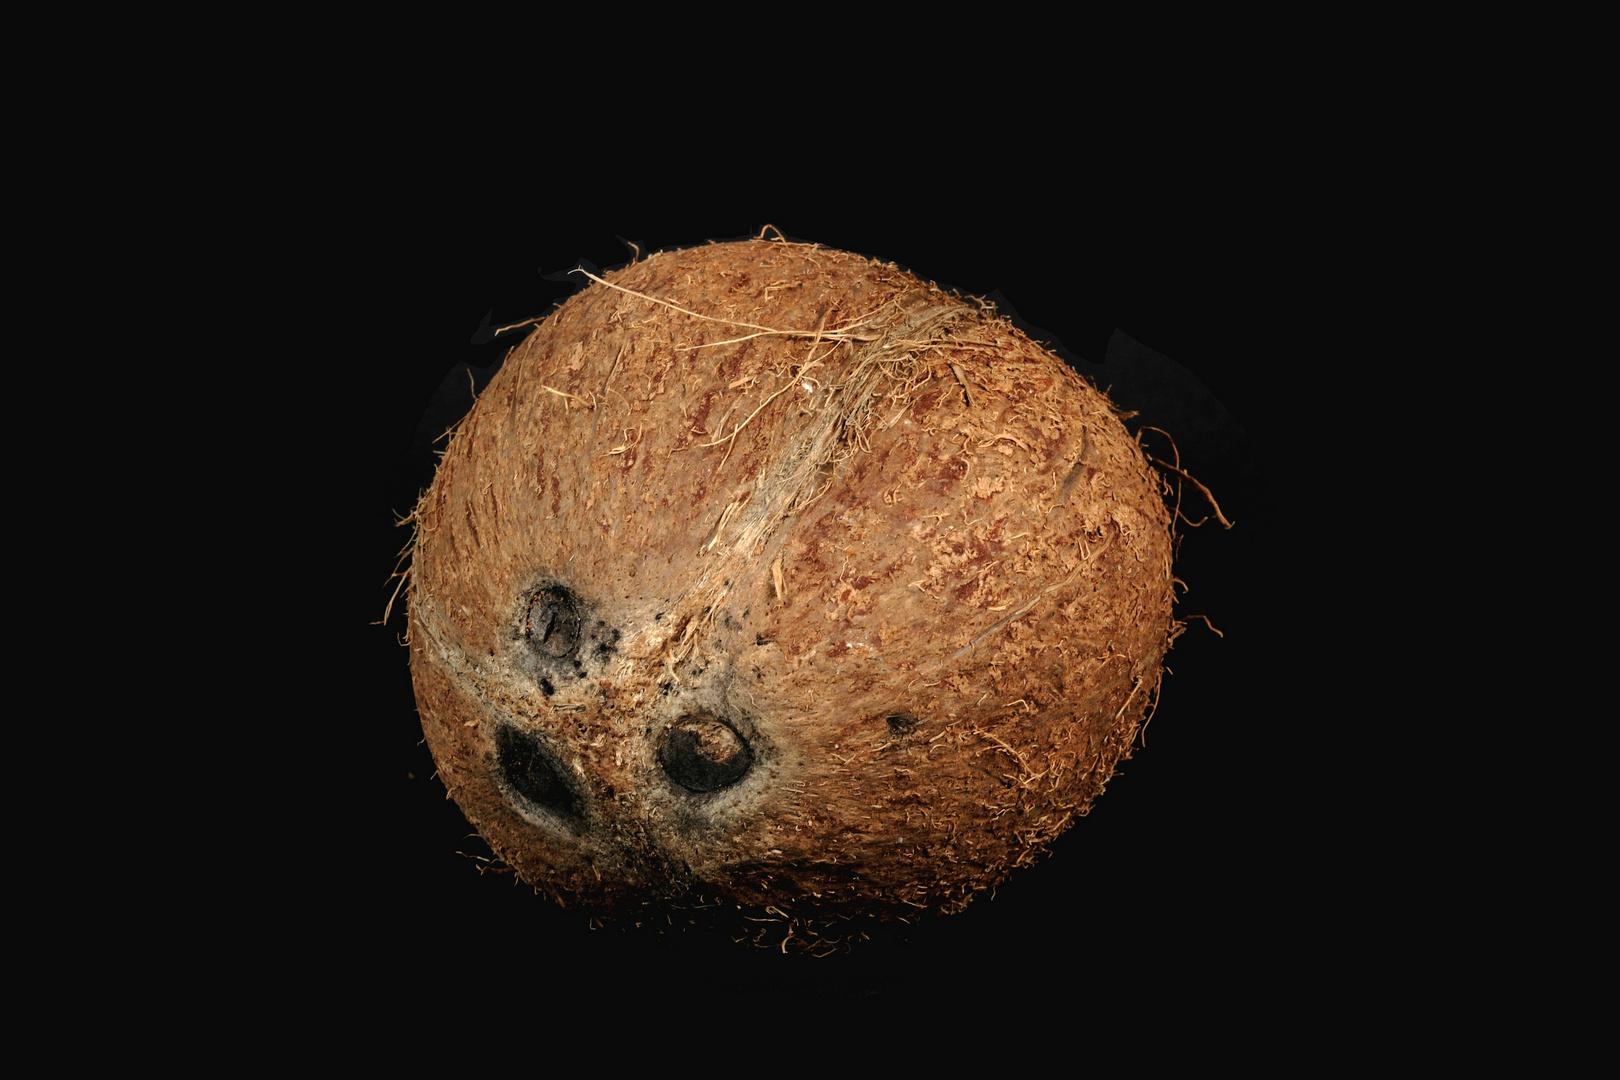 Kokosnuß b